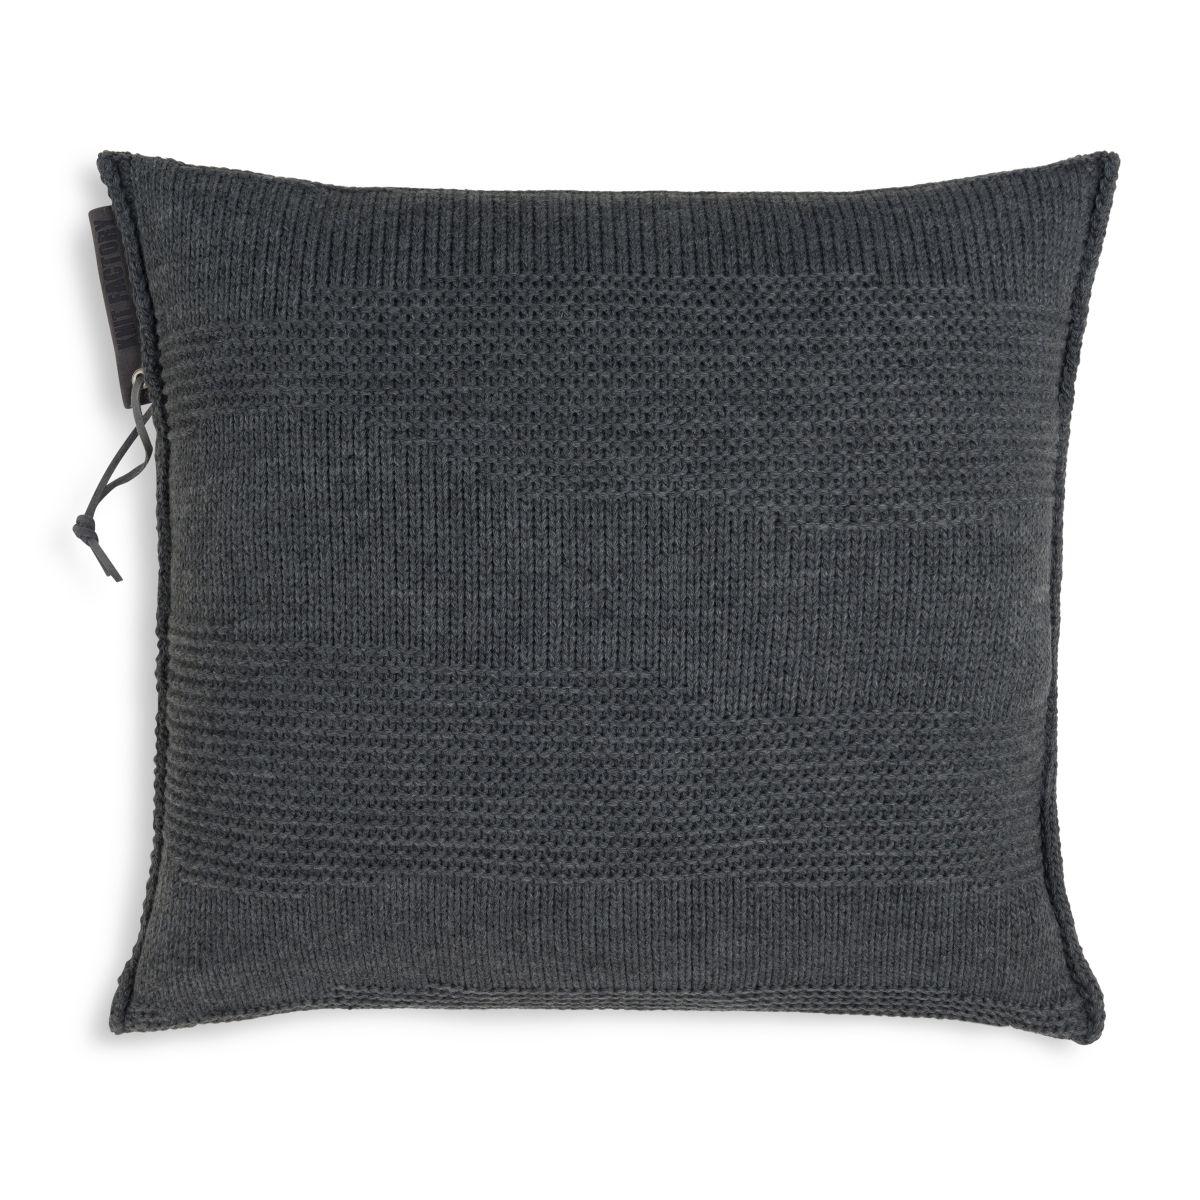 knit factory 1431210 joly kussen 50x50 antraciet 1